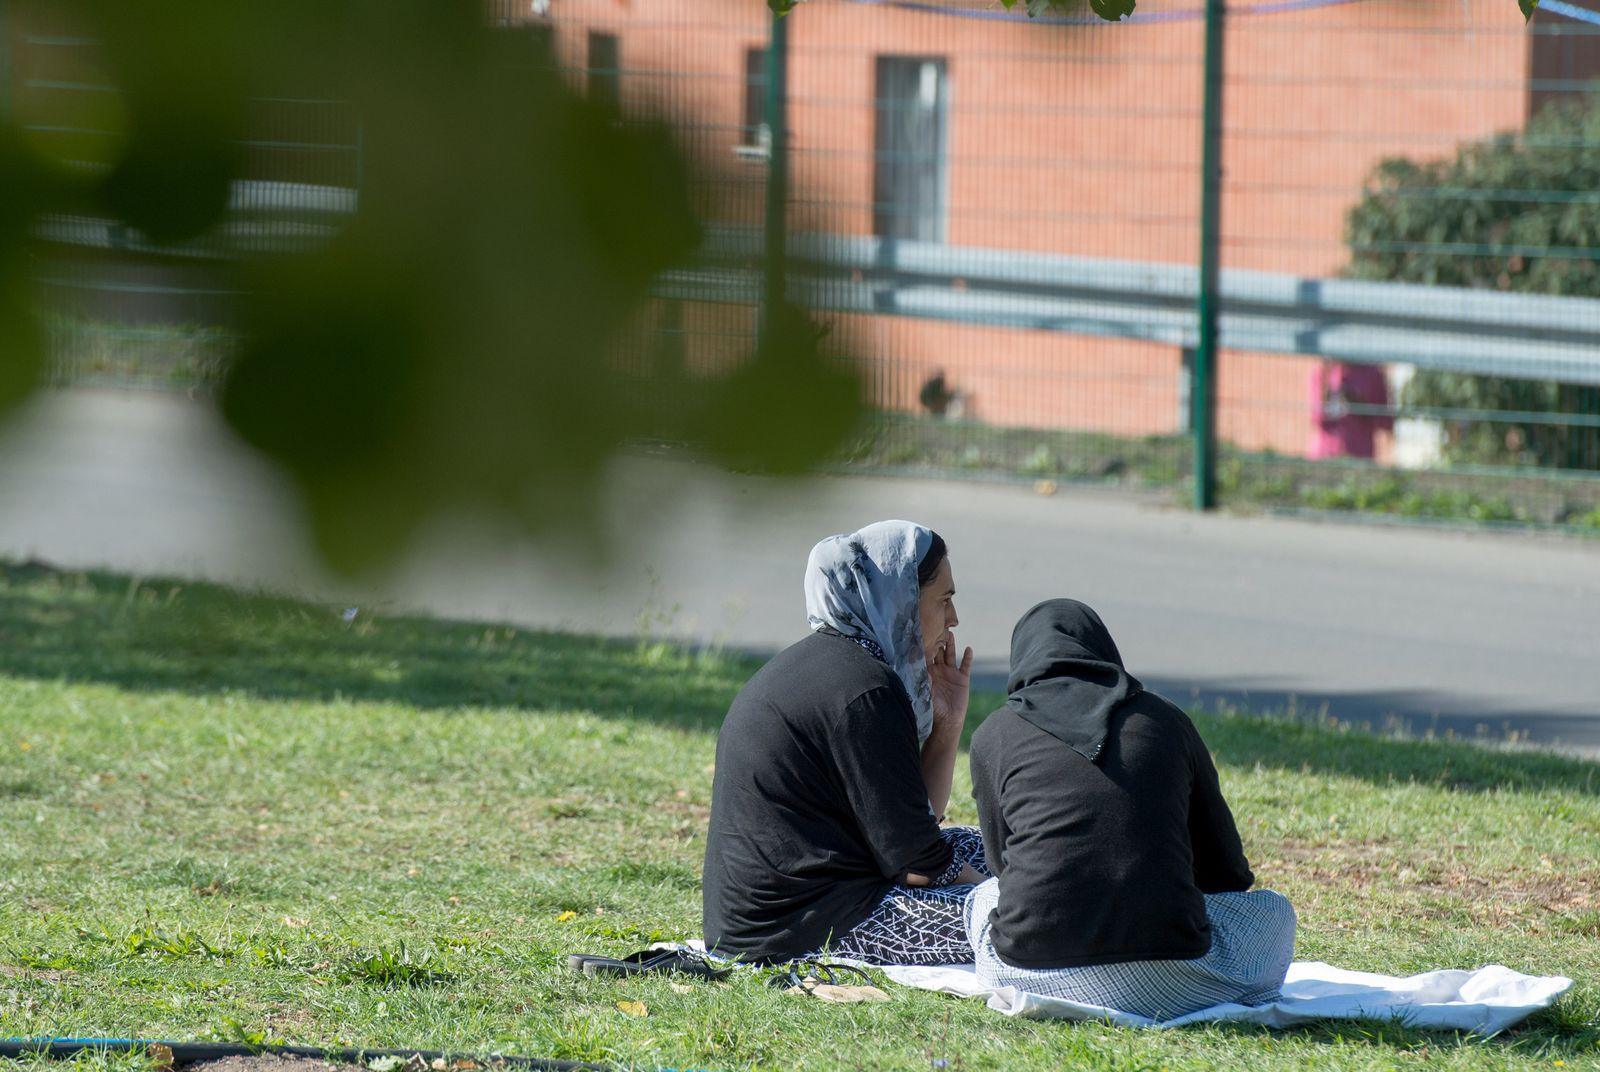 Flüchtlingsunterkunft in Gießen